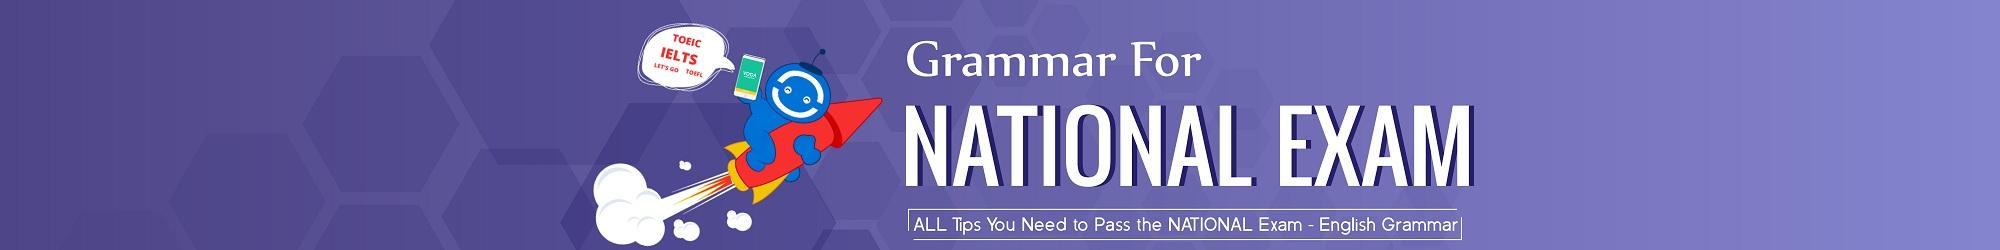 GRAMMAR FOR NATIONAL EXAM banner